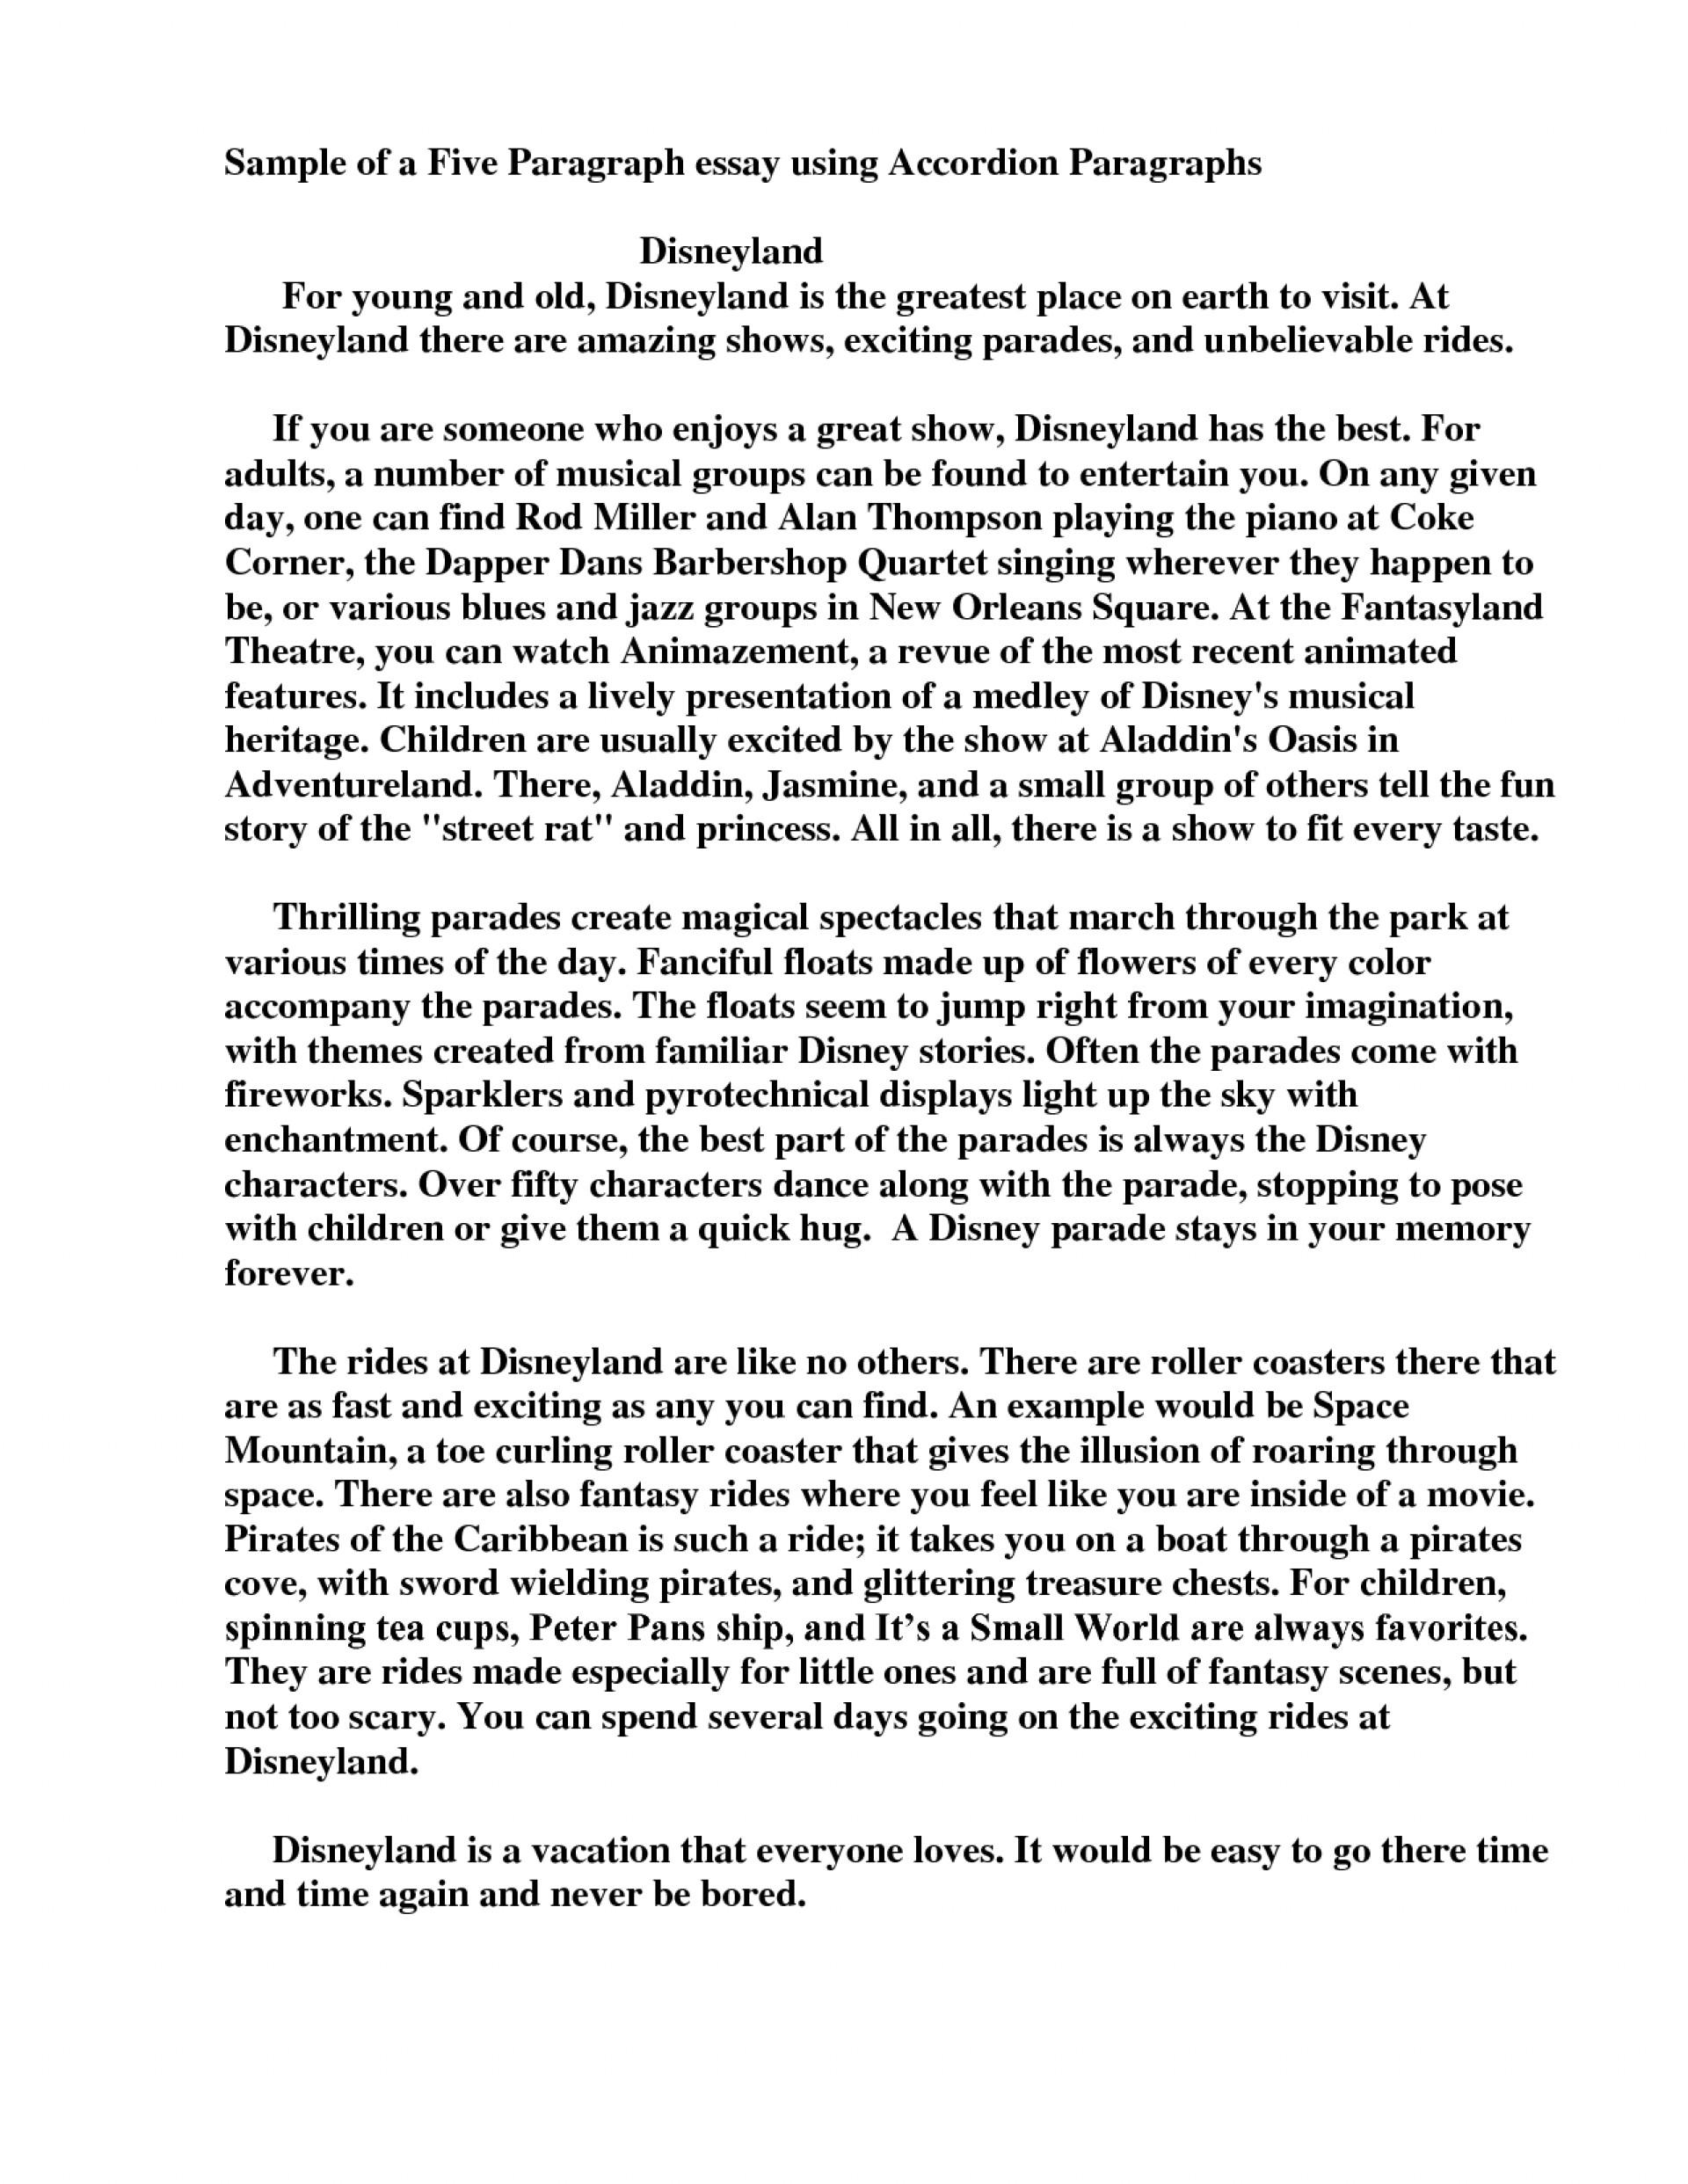 004 Format Of Paragraph Essay Inspirational Sample Five Stirring 5 Free Outline Template Printable Argumentative 1920